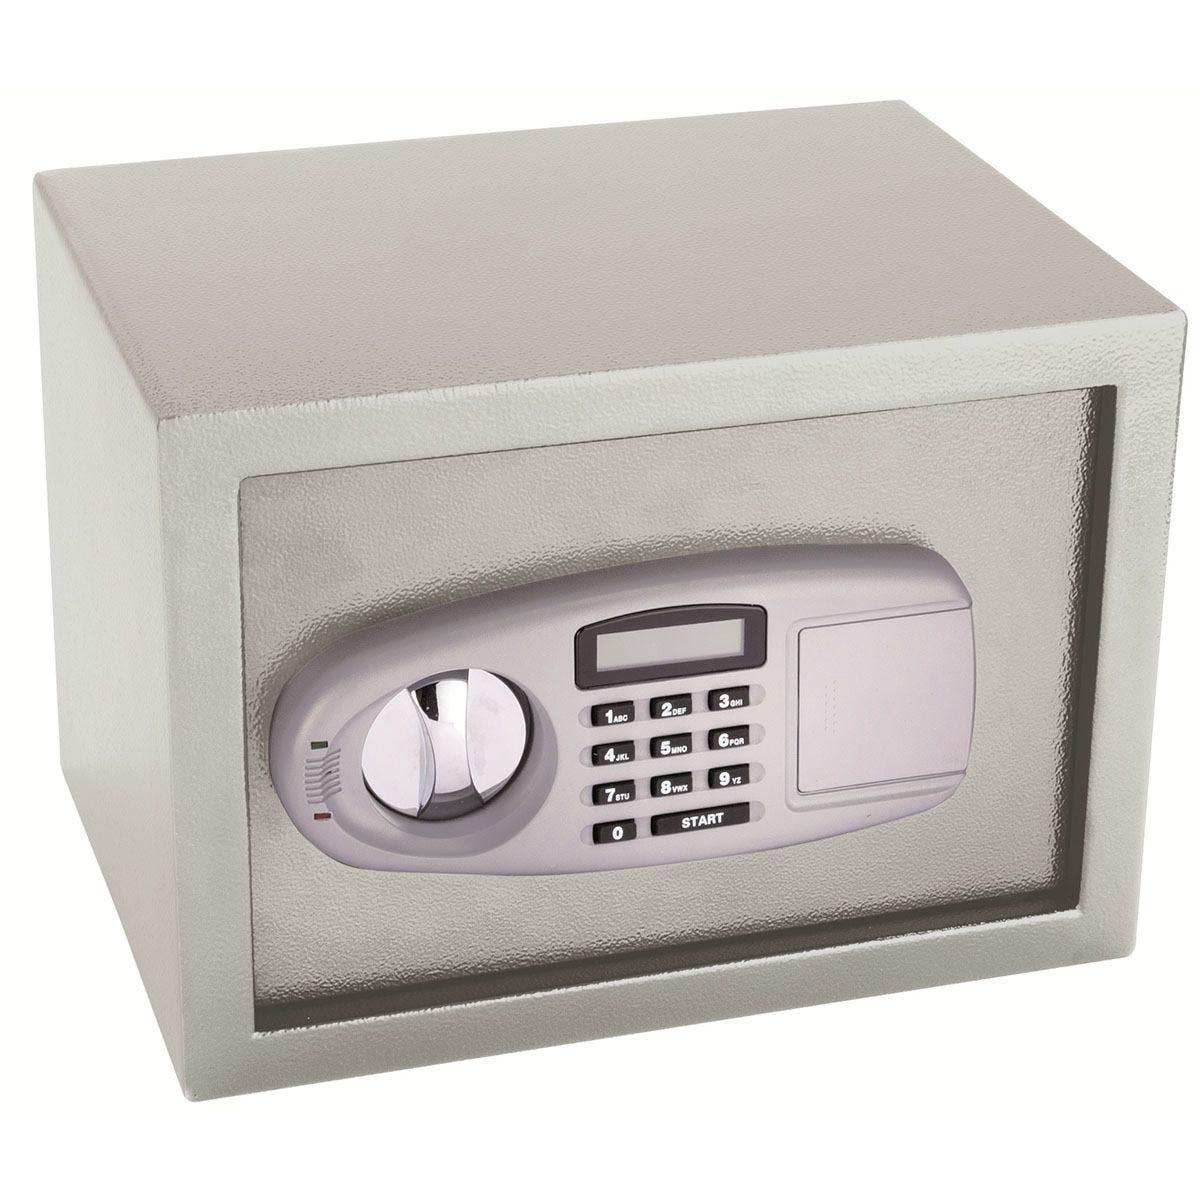 Draper Digital Electronic Safe (16L) - Cream